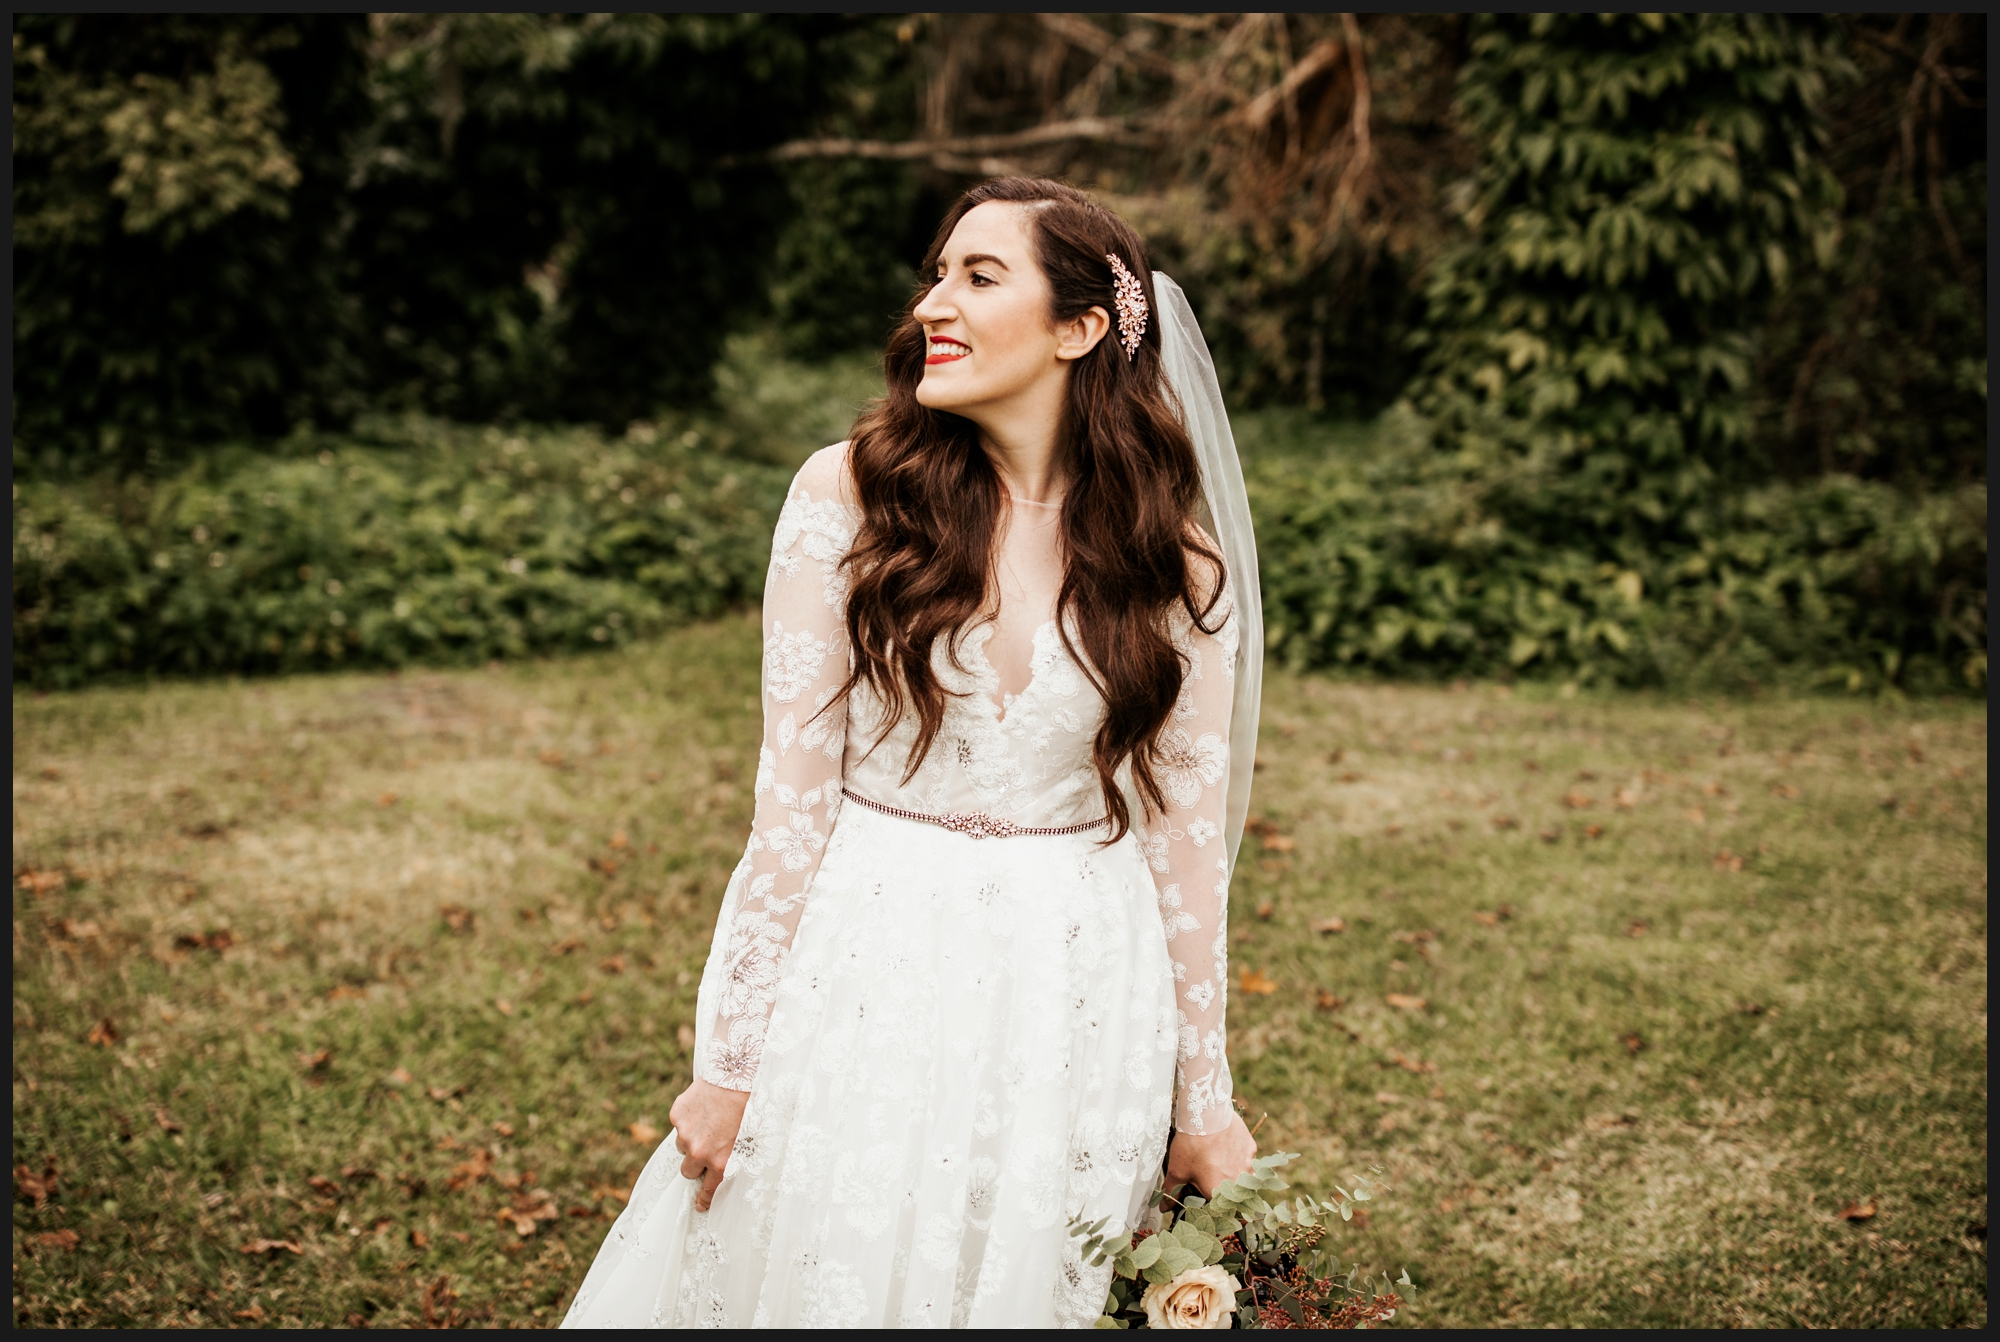 Orlando-Wedding-Photographer-destination-wedding-photographer-florida-wedding-photographer-hawaii-wedding-photographer_0512.jpg